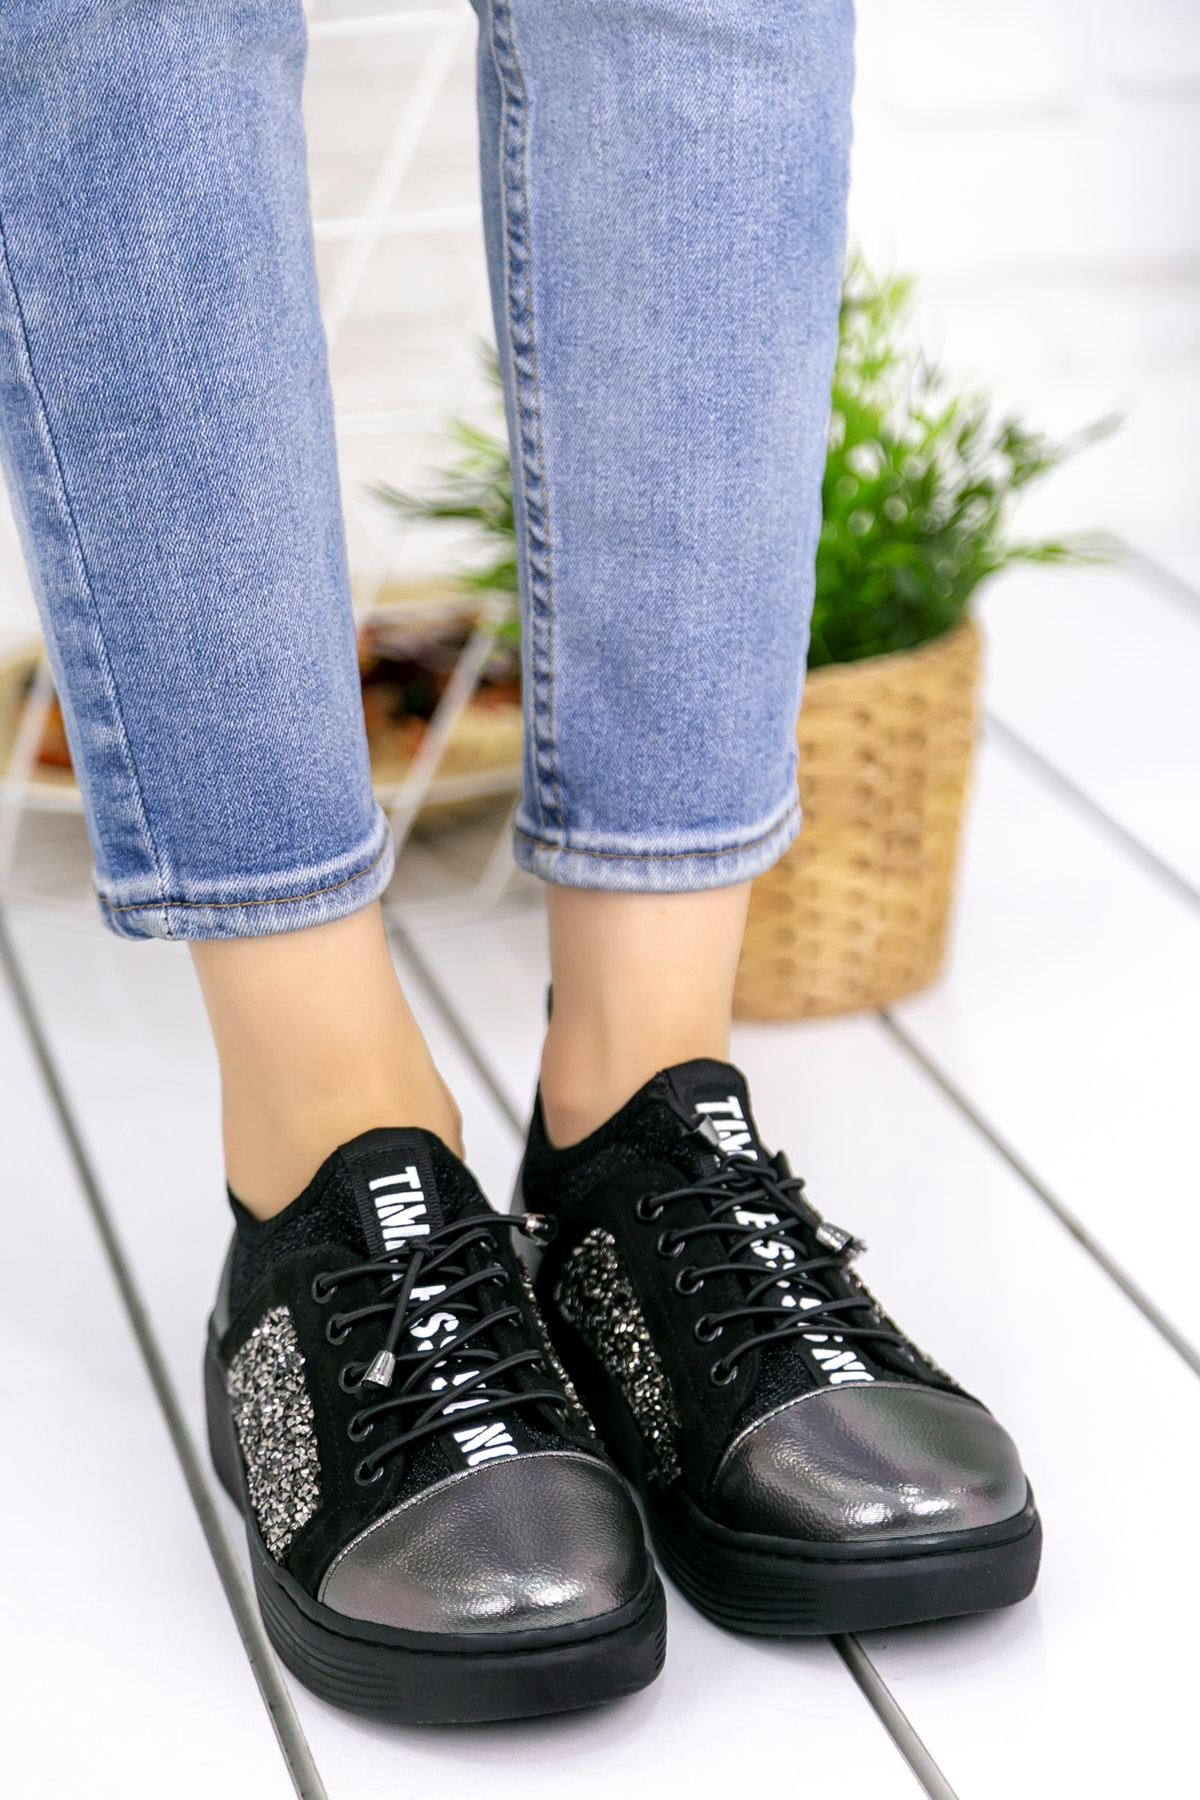 Cappi Rugan Taş Detay Dalgıç Kumaş Spor Ayakkabı Platin